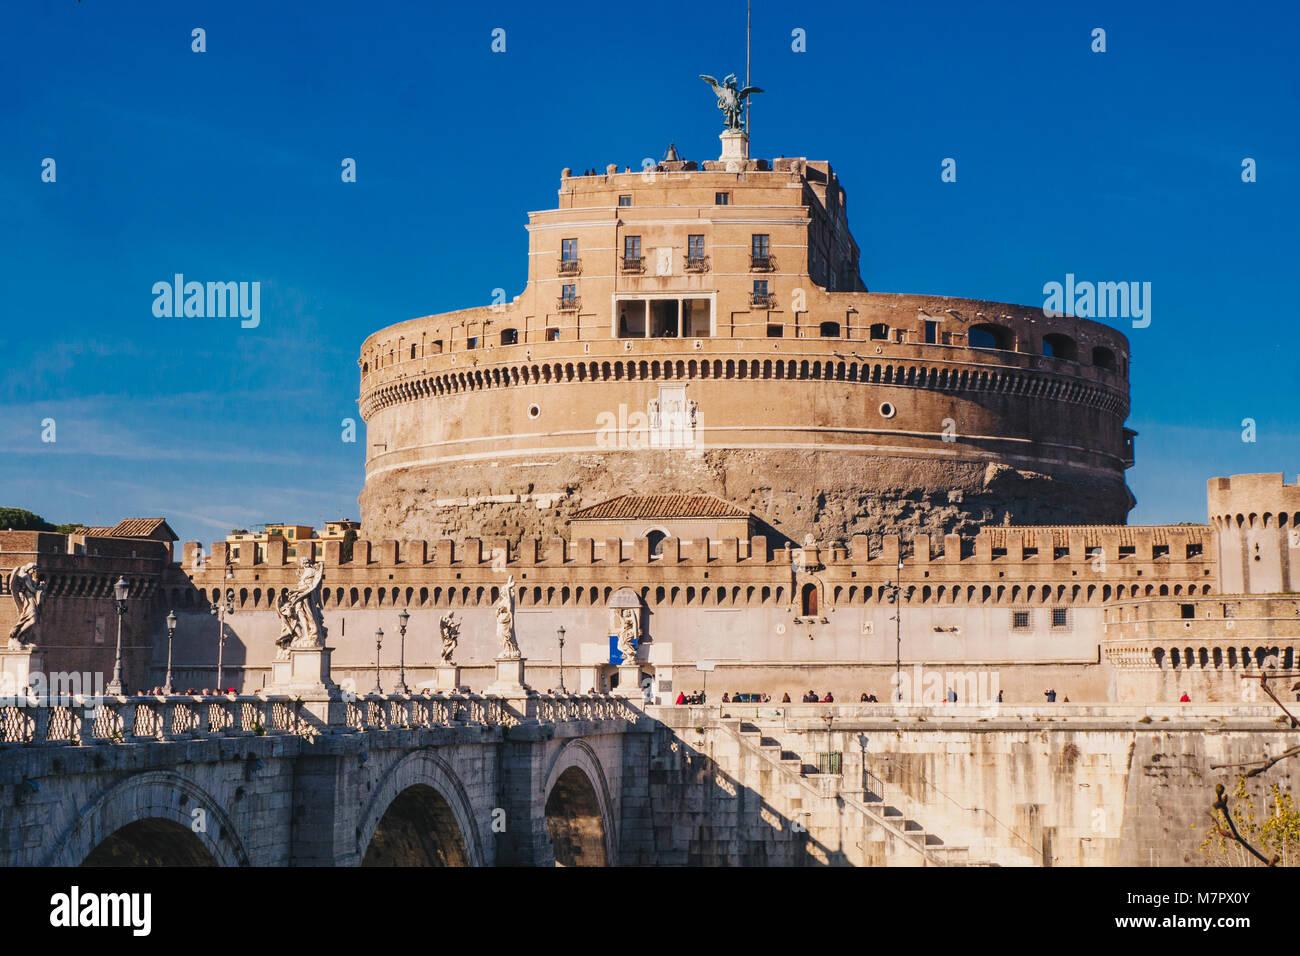 Saint Angelo Castle and Saint Angelo Bridge over Tiber River in Rome, Italy - Stock Image